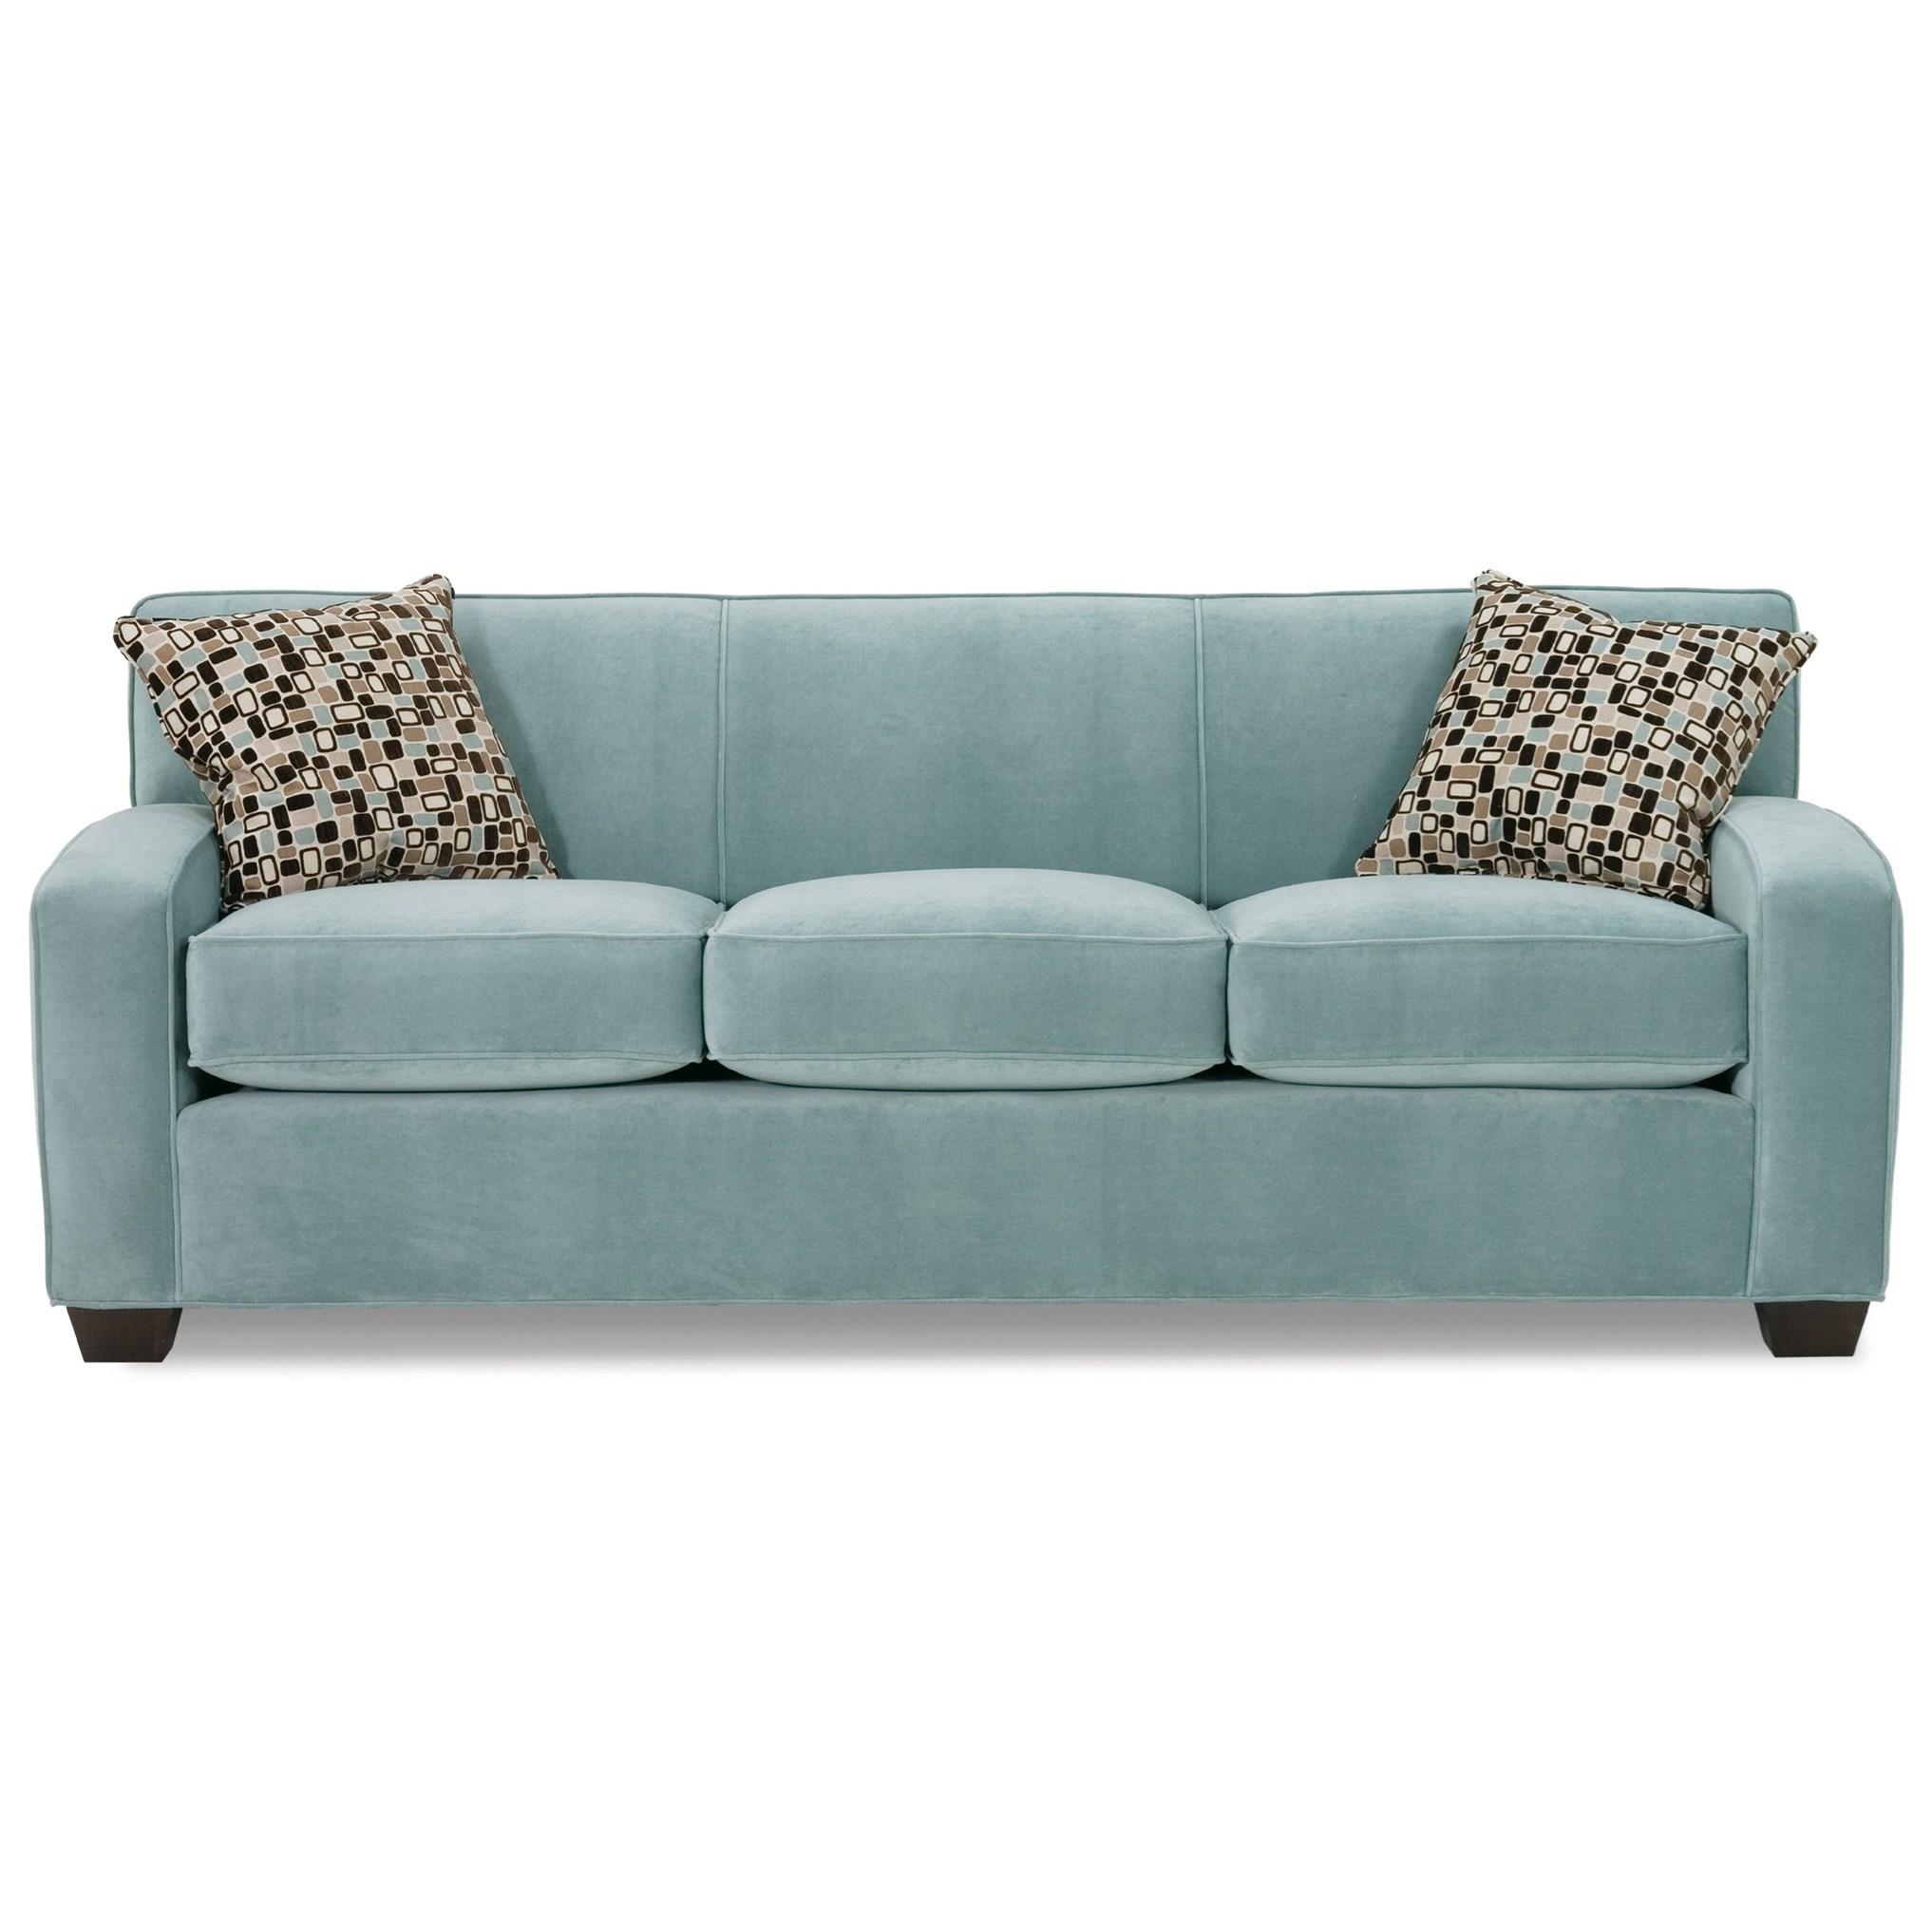 Horizon Transitional Sofa by Rowe at Bullard Furniture